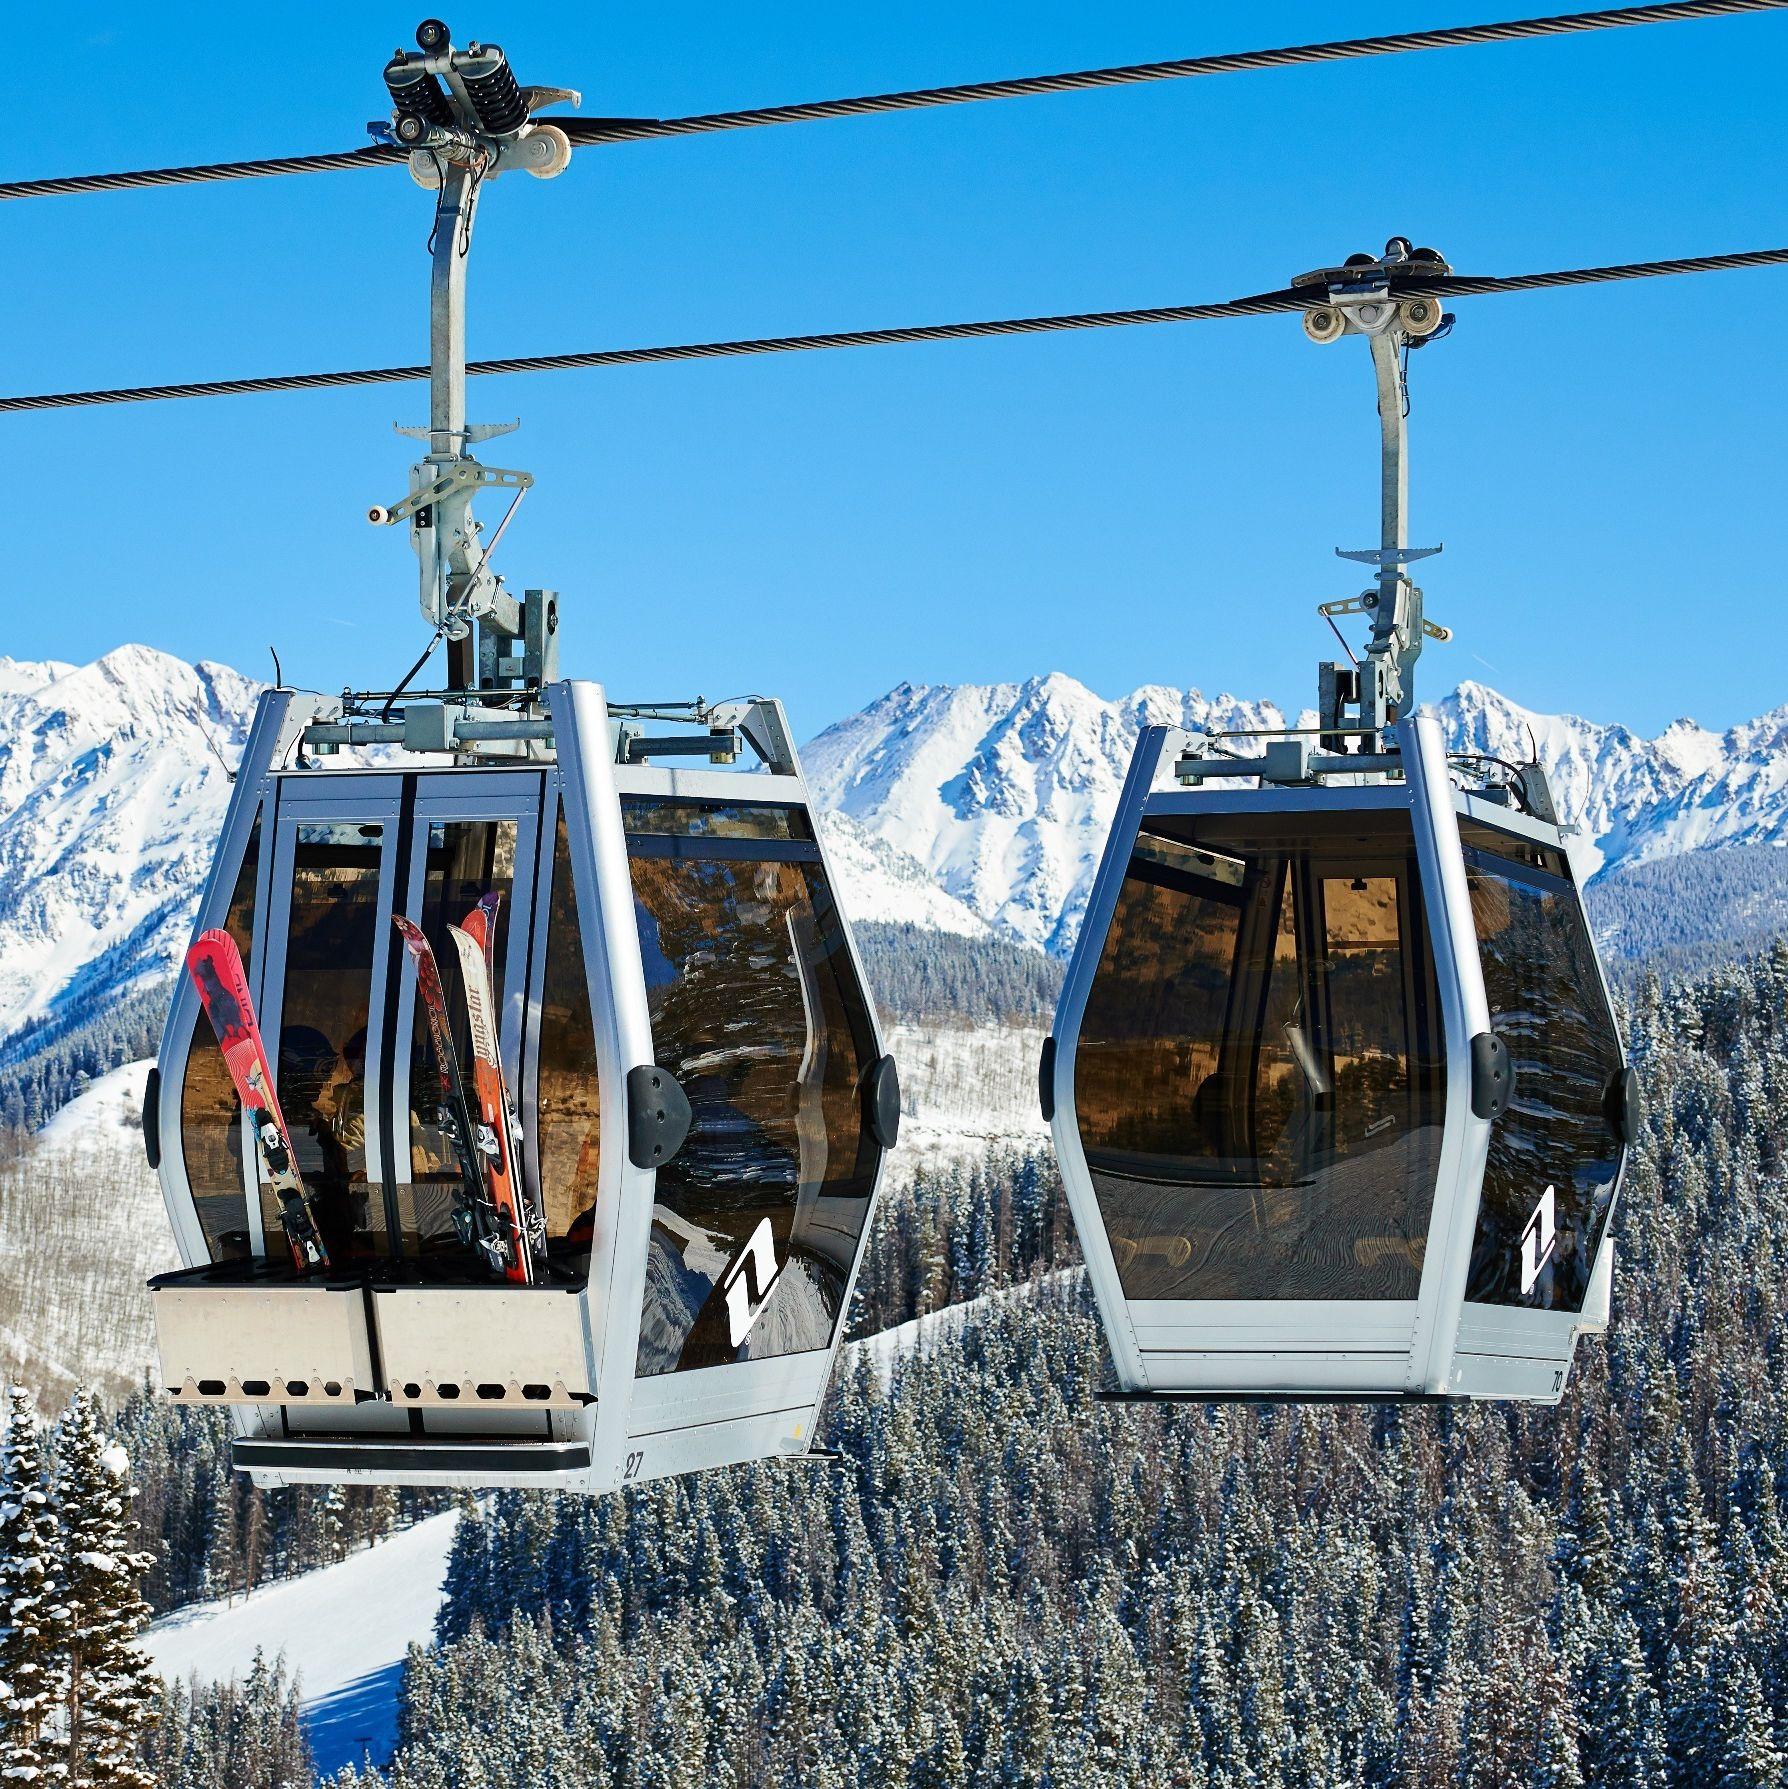 Gondola one vailresorts vcd10824 jack affleck highres a4jtfh